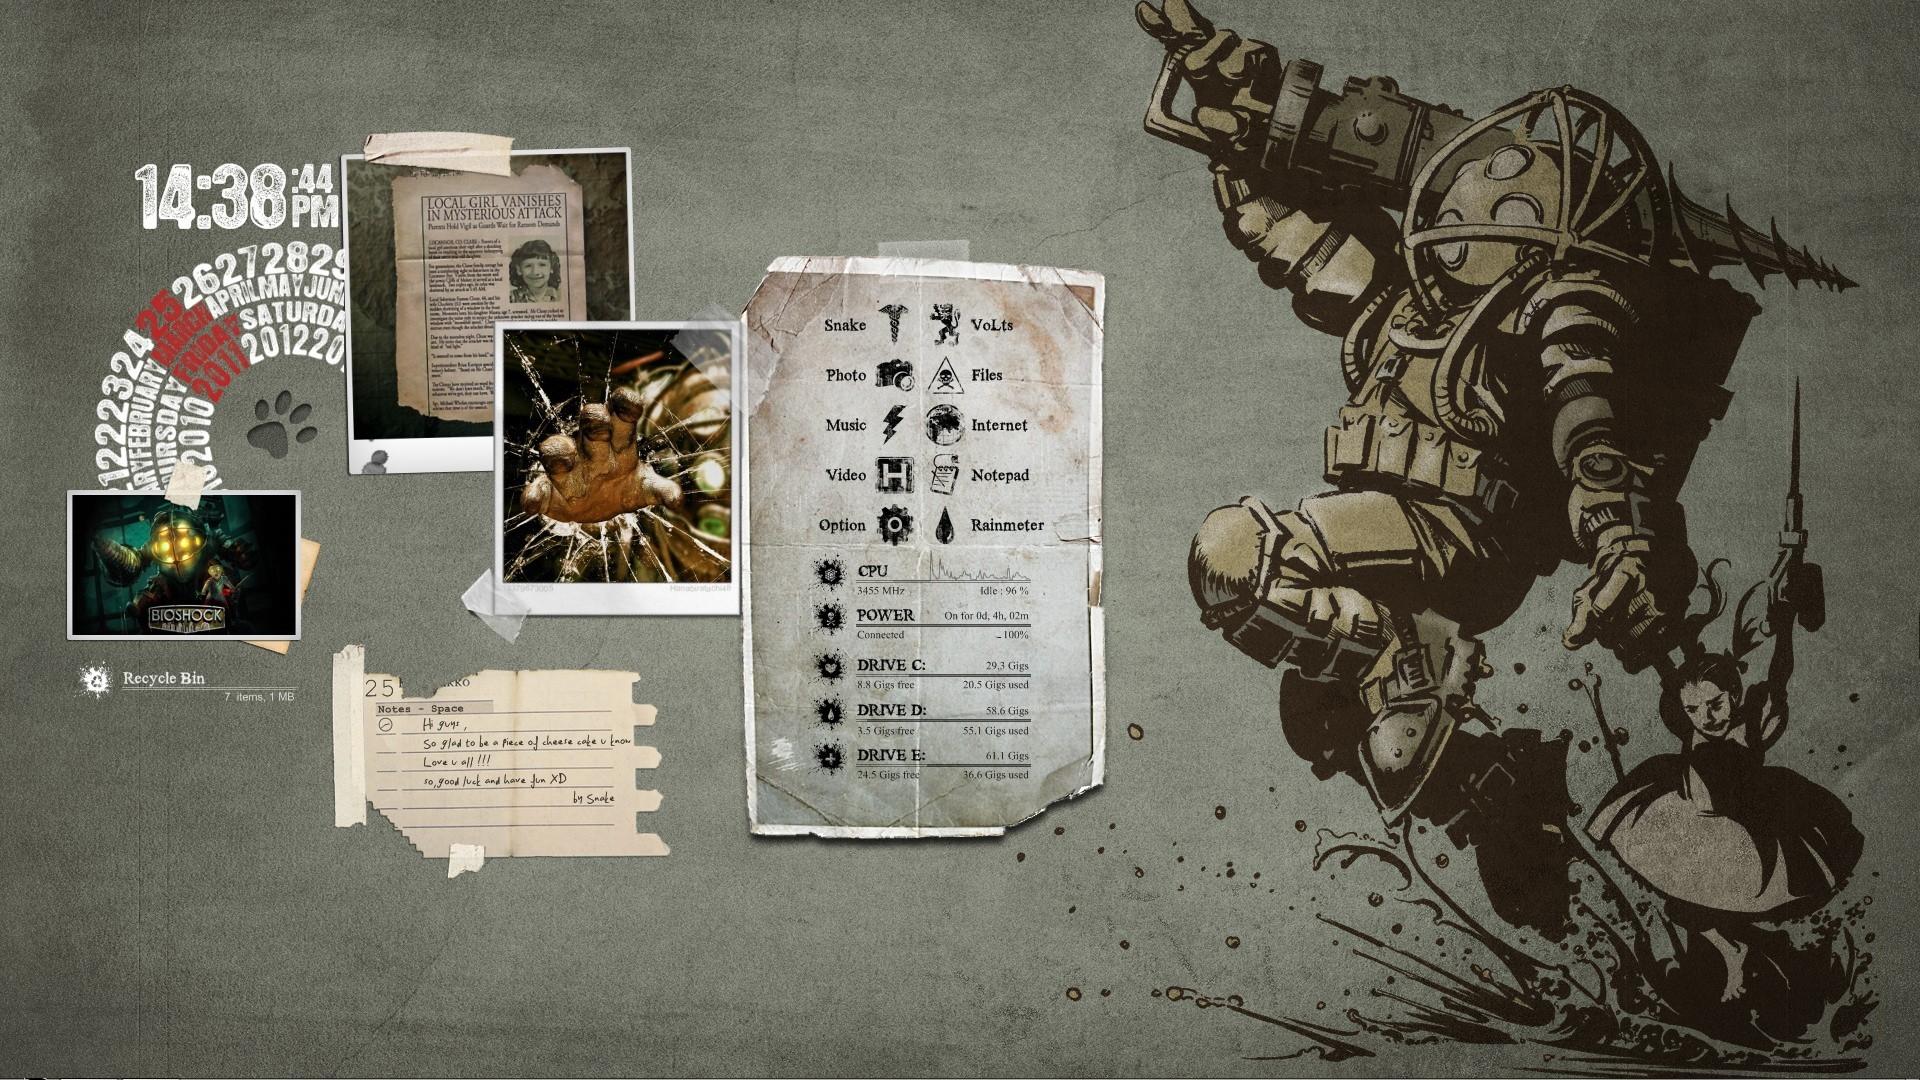 Bioshock HD Wallpapers Backgrounds Wallpaper